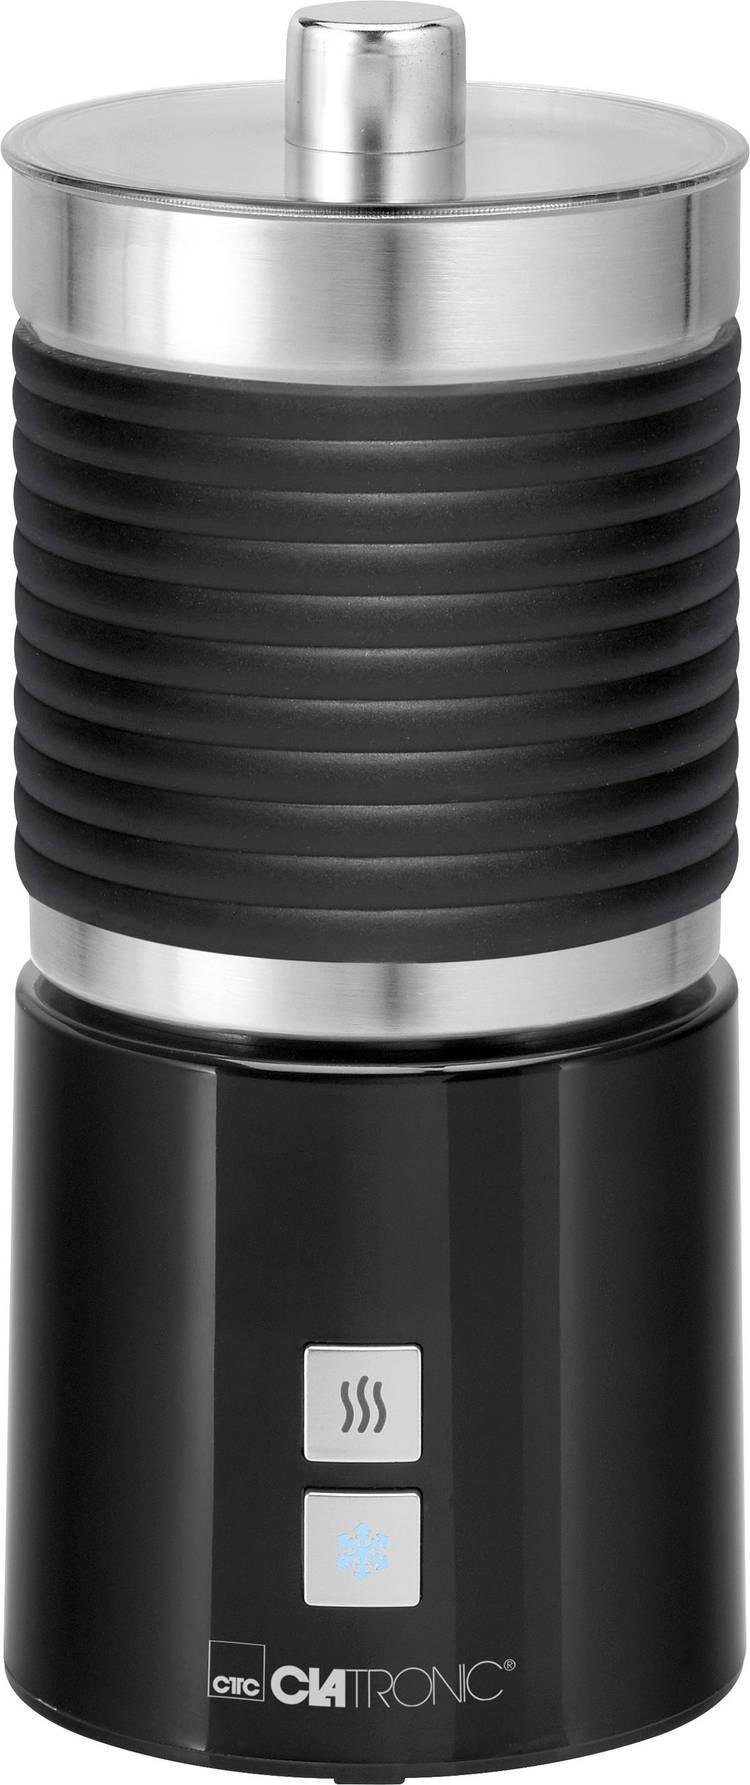 Image of Clatronic MS 3654 Melkopschuimer 650 W 700 ml Zwart